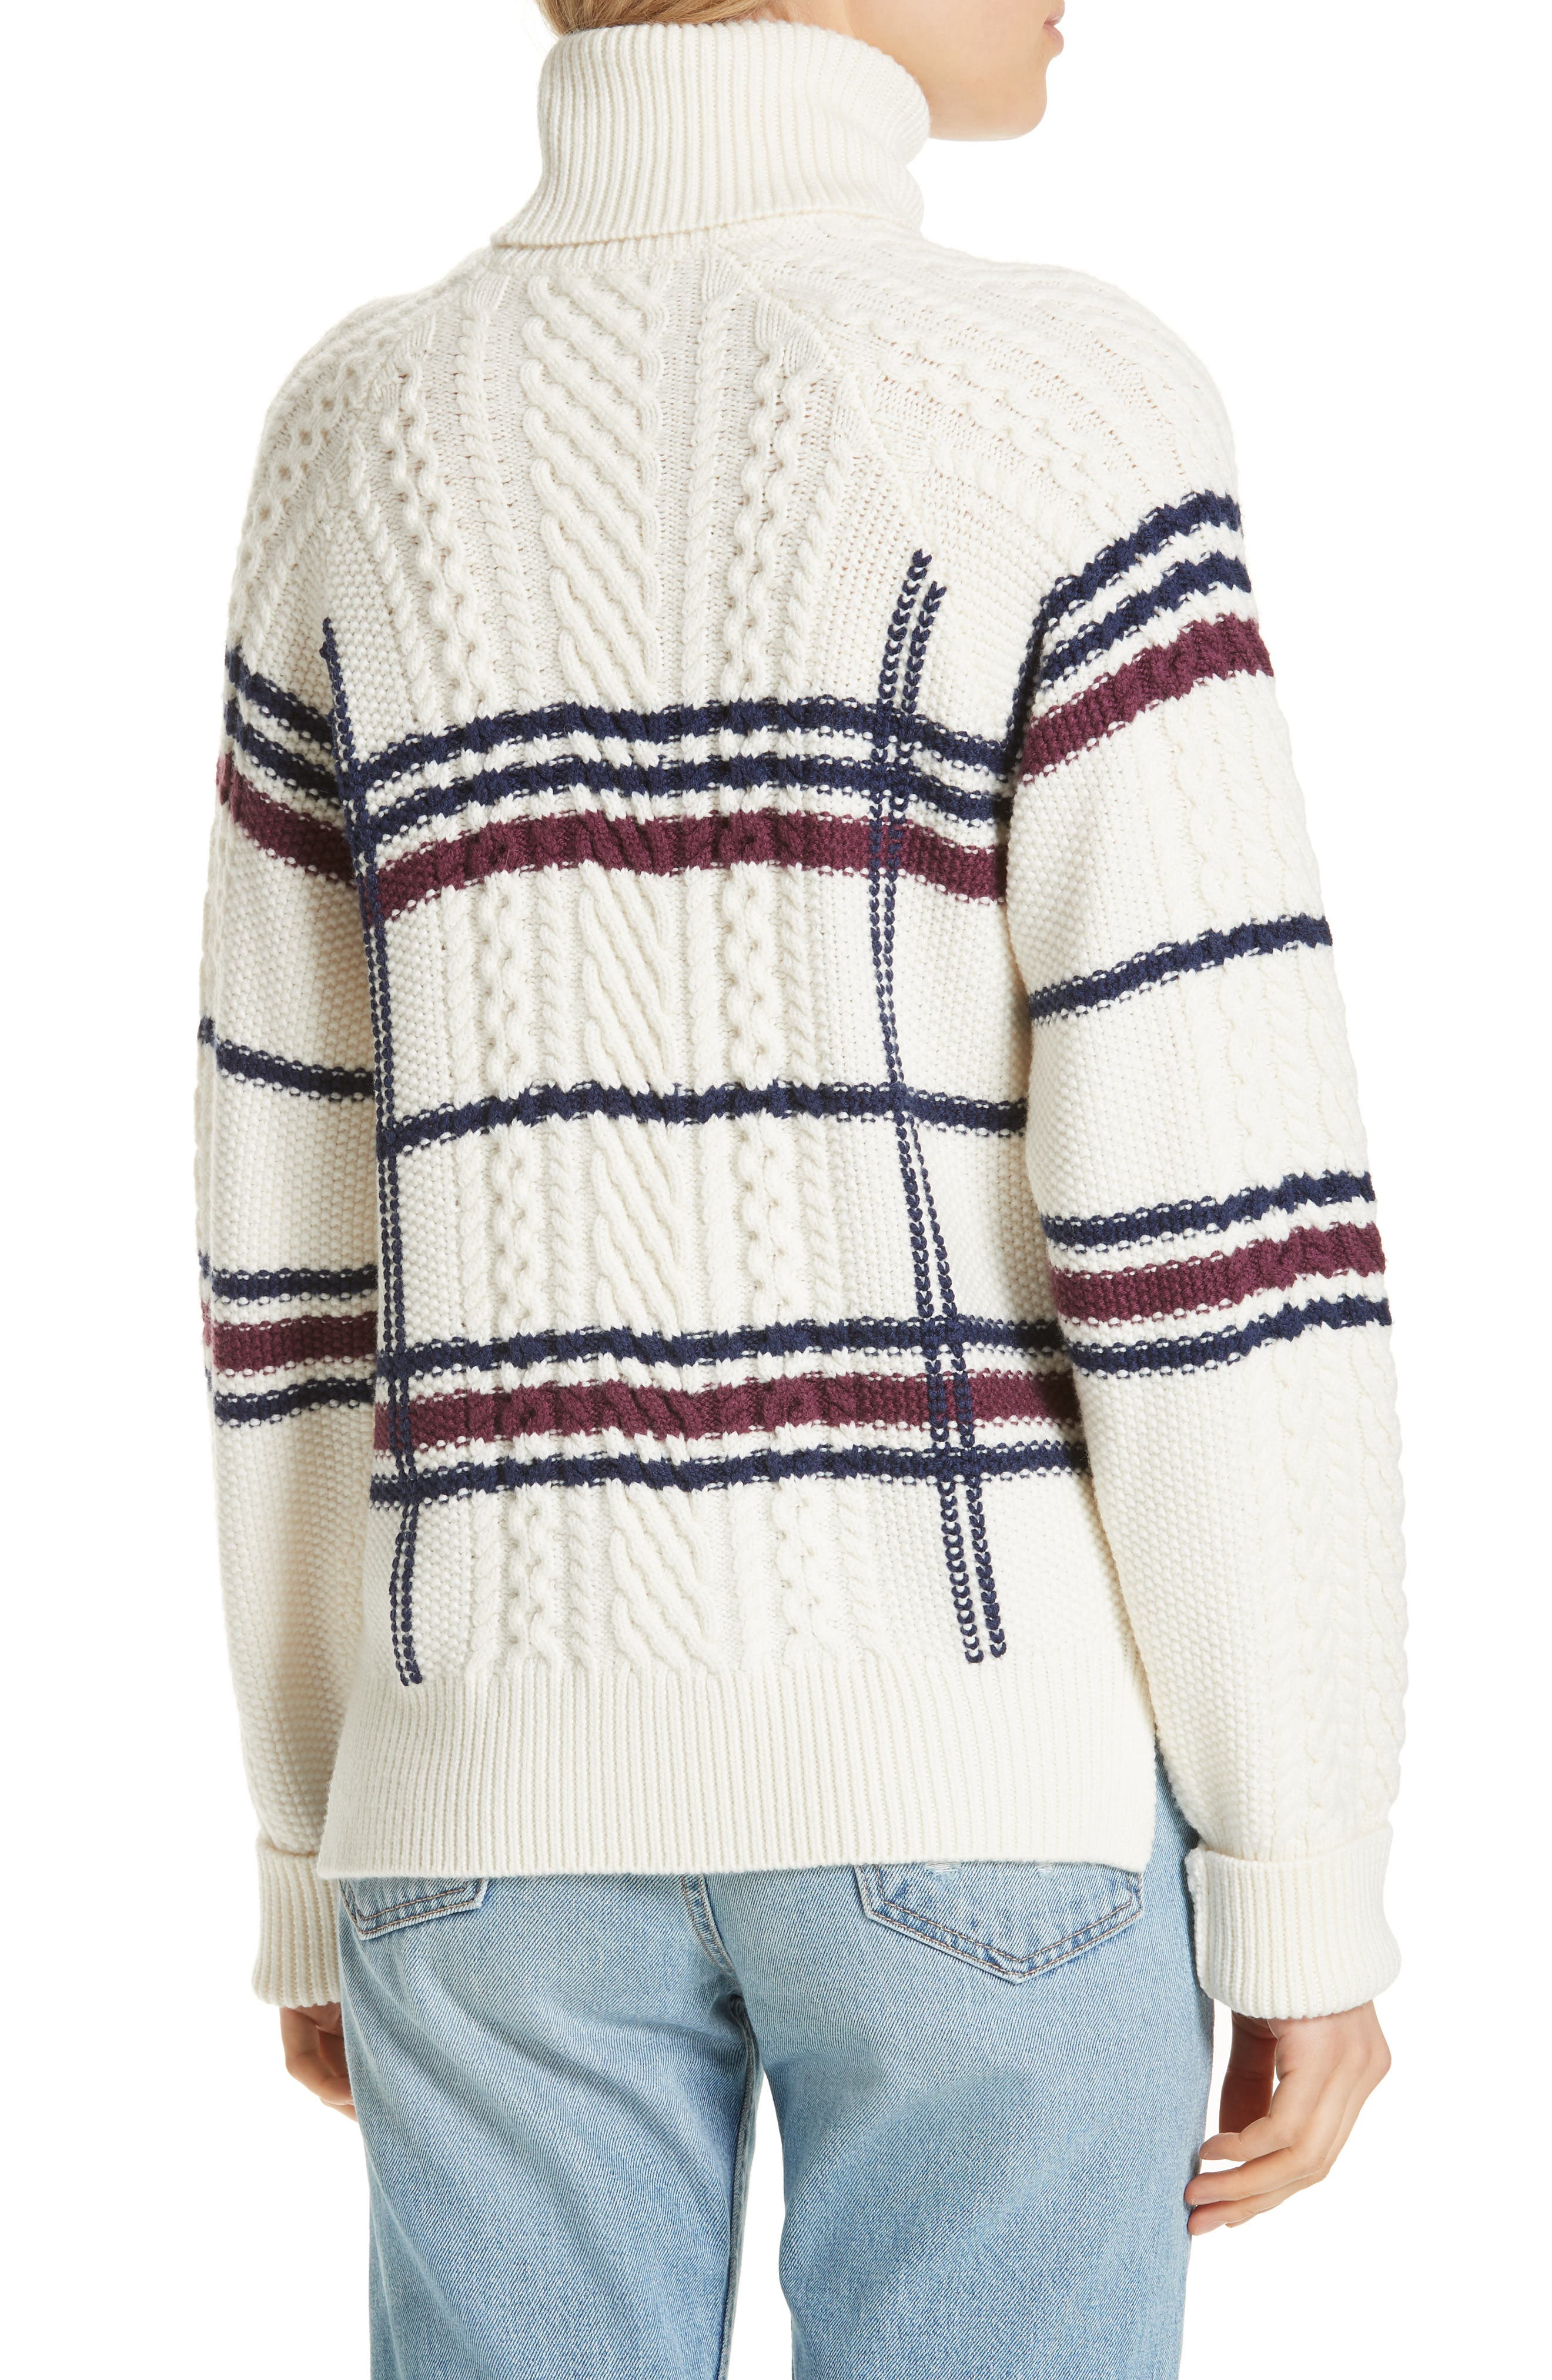 Ashlisa Sweater,                             Alternate thumbnail 2, color,                             PORCELAIN